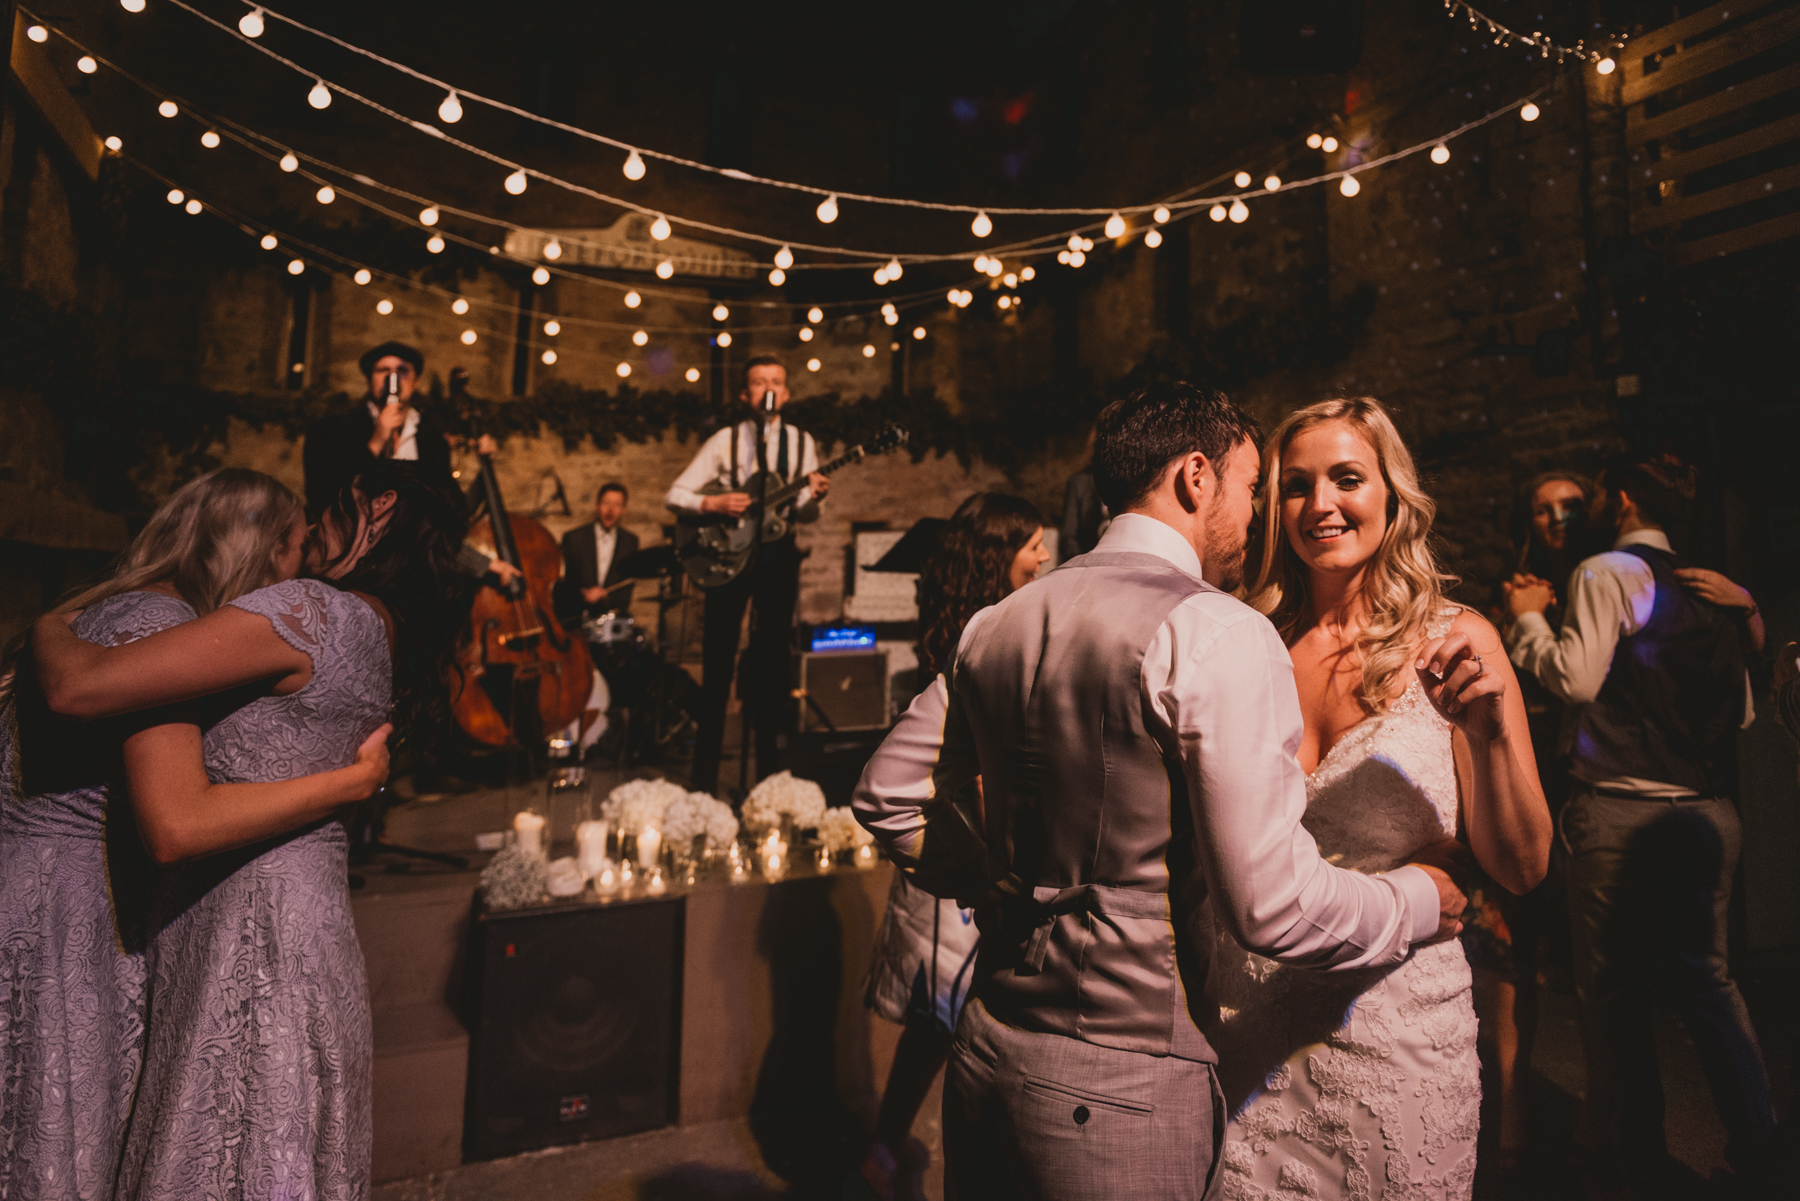 Herefordshire-barn-wedding-highlights-156.jpg